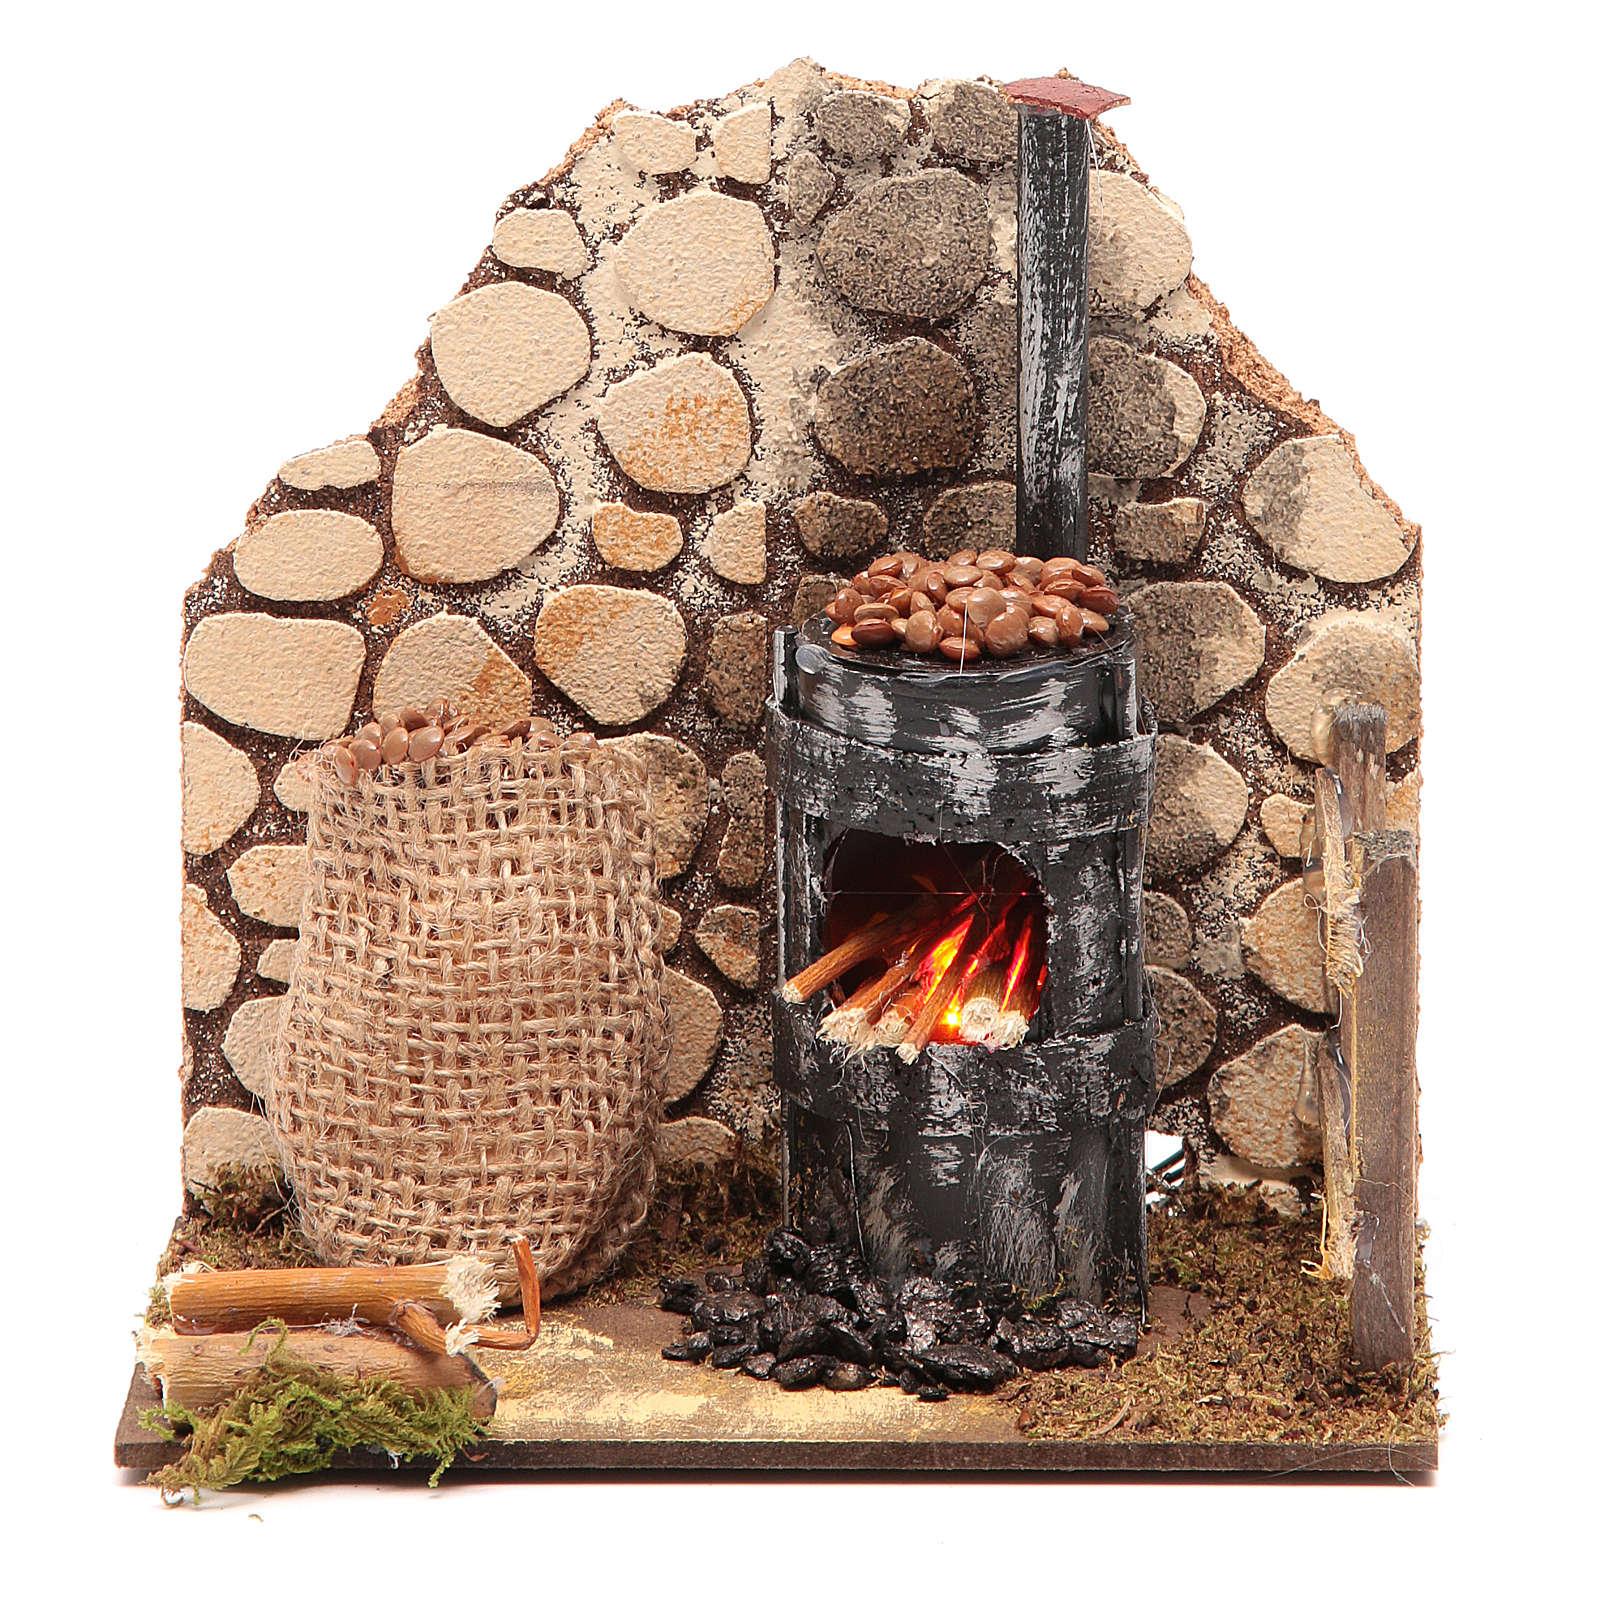 Chestnut seller furnace with 2 battery led lights 15x15x10 cm 4